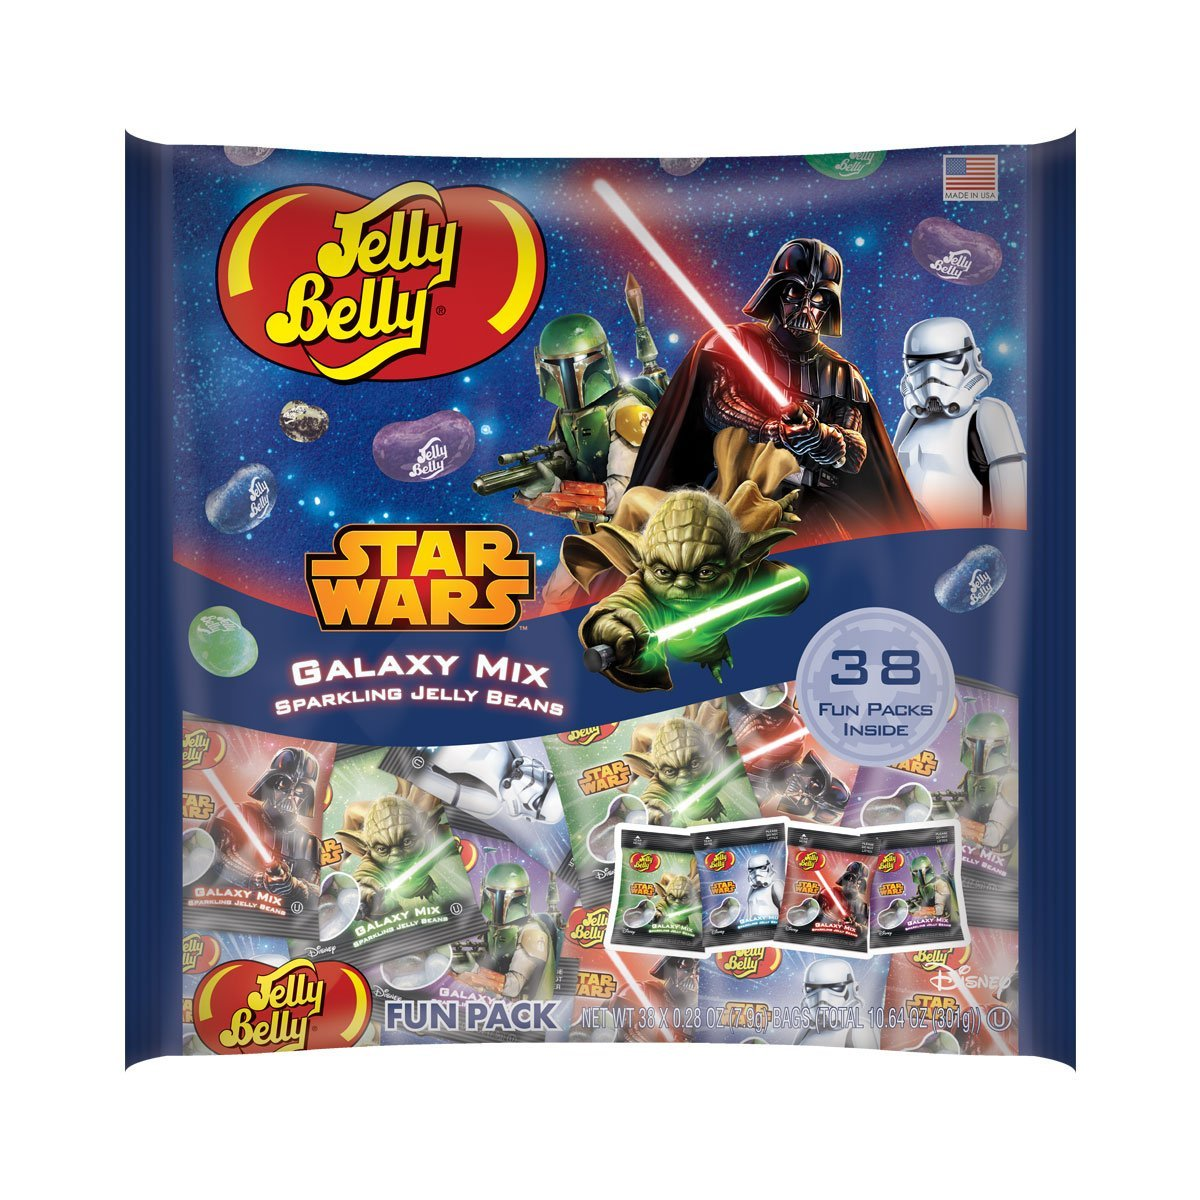 Jelly Belly Star Wars Galaxy Mix (2015)